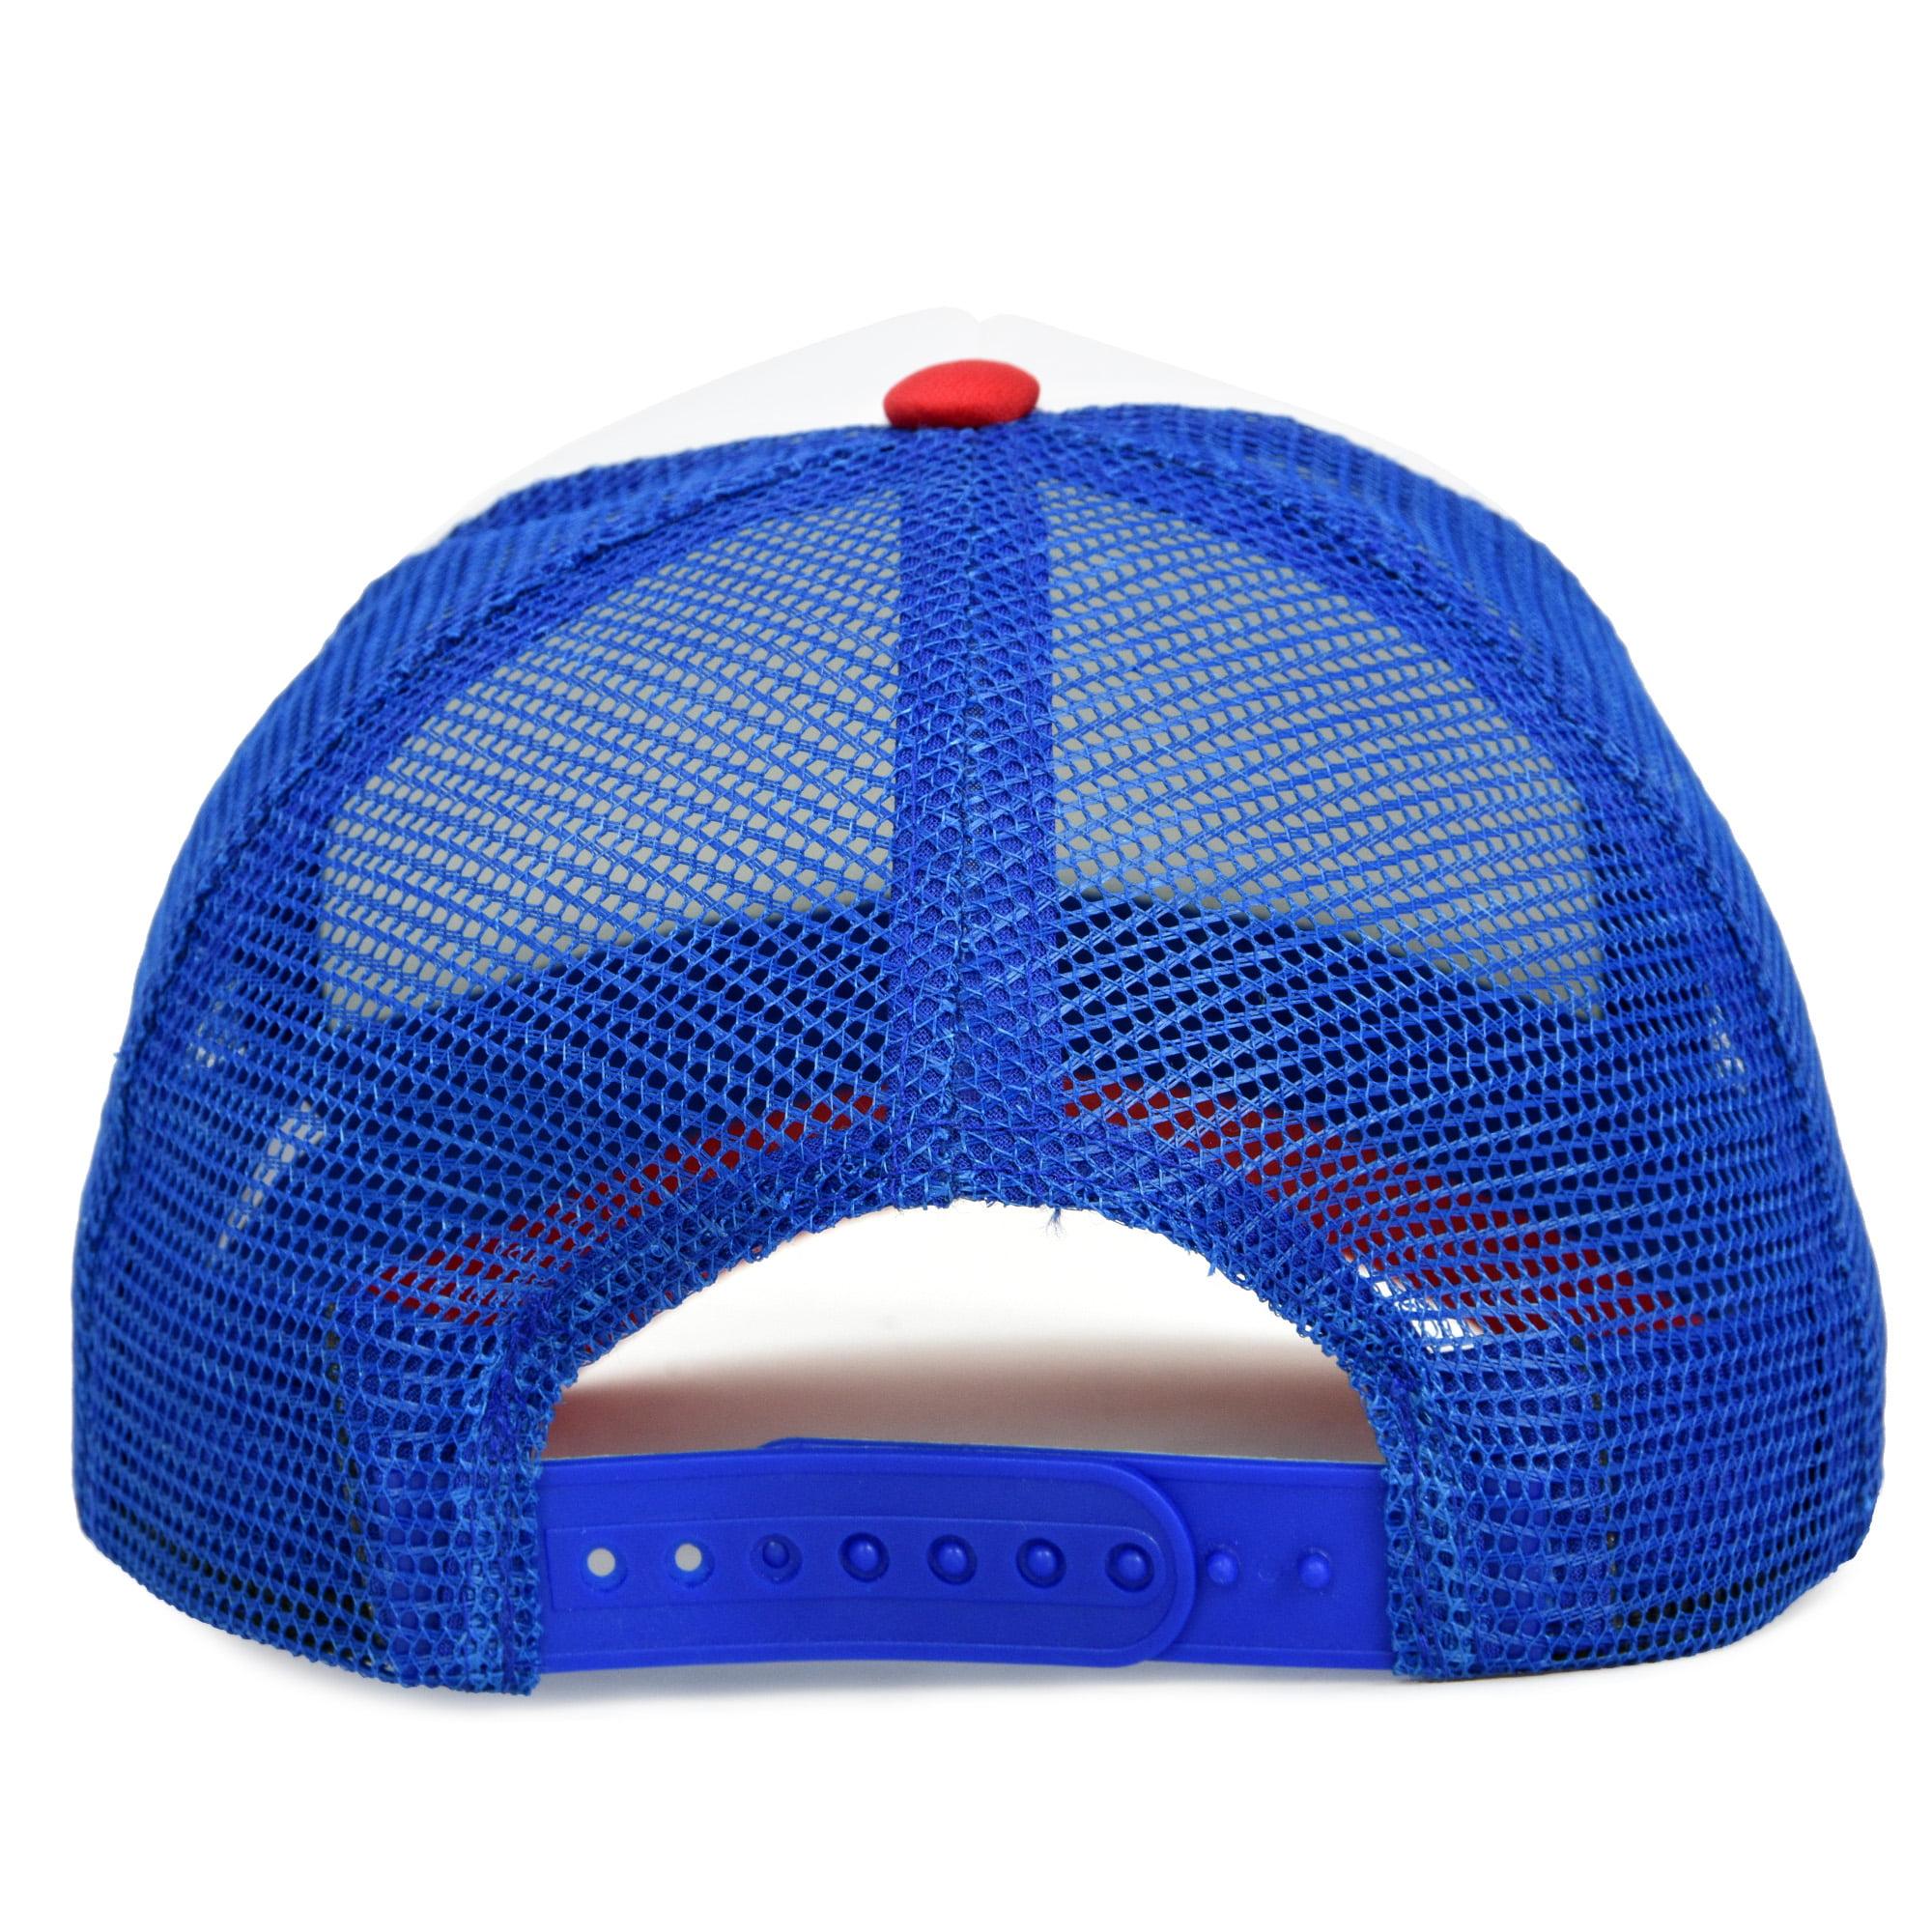 TCJX How to Pick Up Chicks Mesh Baseball Cap Girls Adjustable Trucker Hat Sky Blue